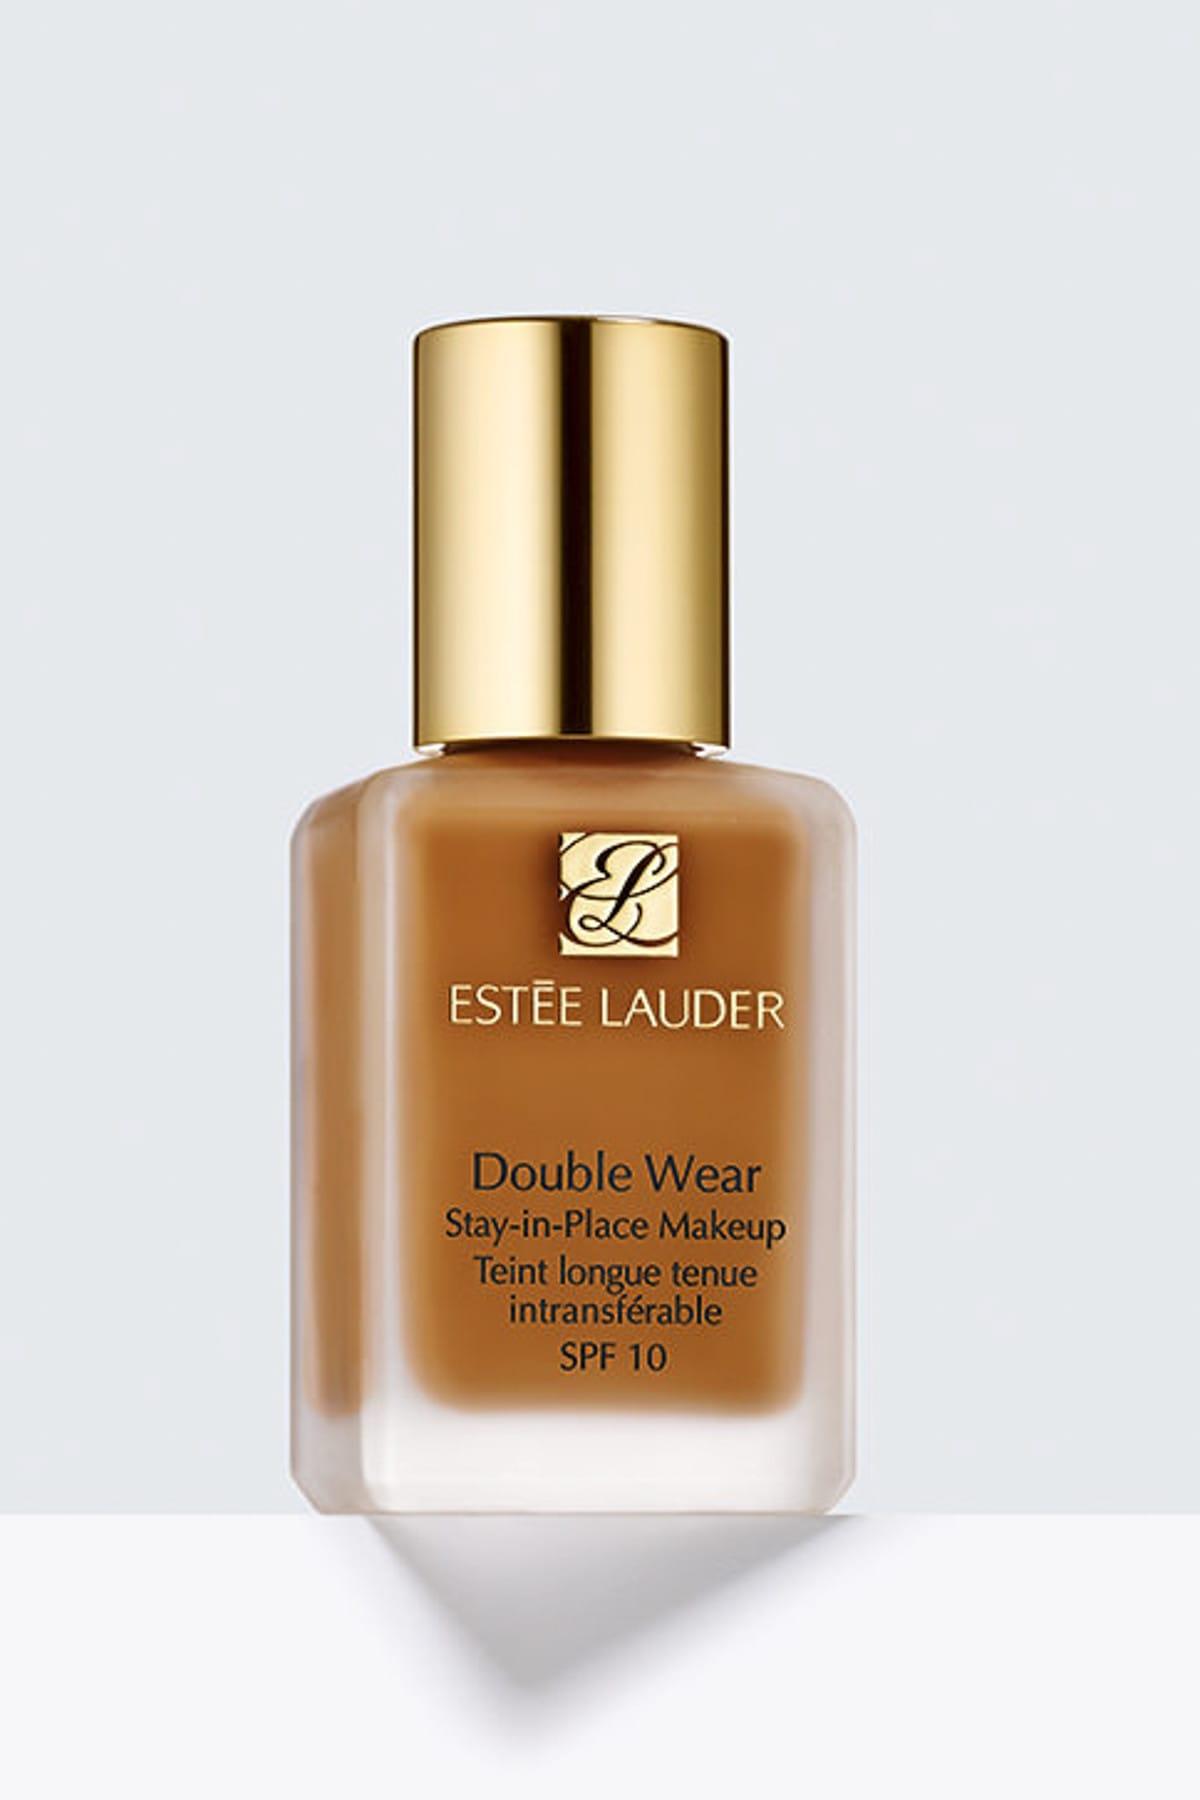 Estee Lauder Fondöten - Double Wear Foundation S.I.P Spf10 5N2 Amber Honey30 ml 027131977964 1